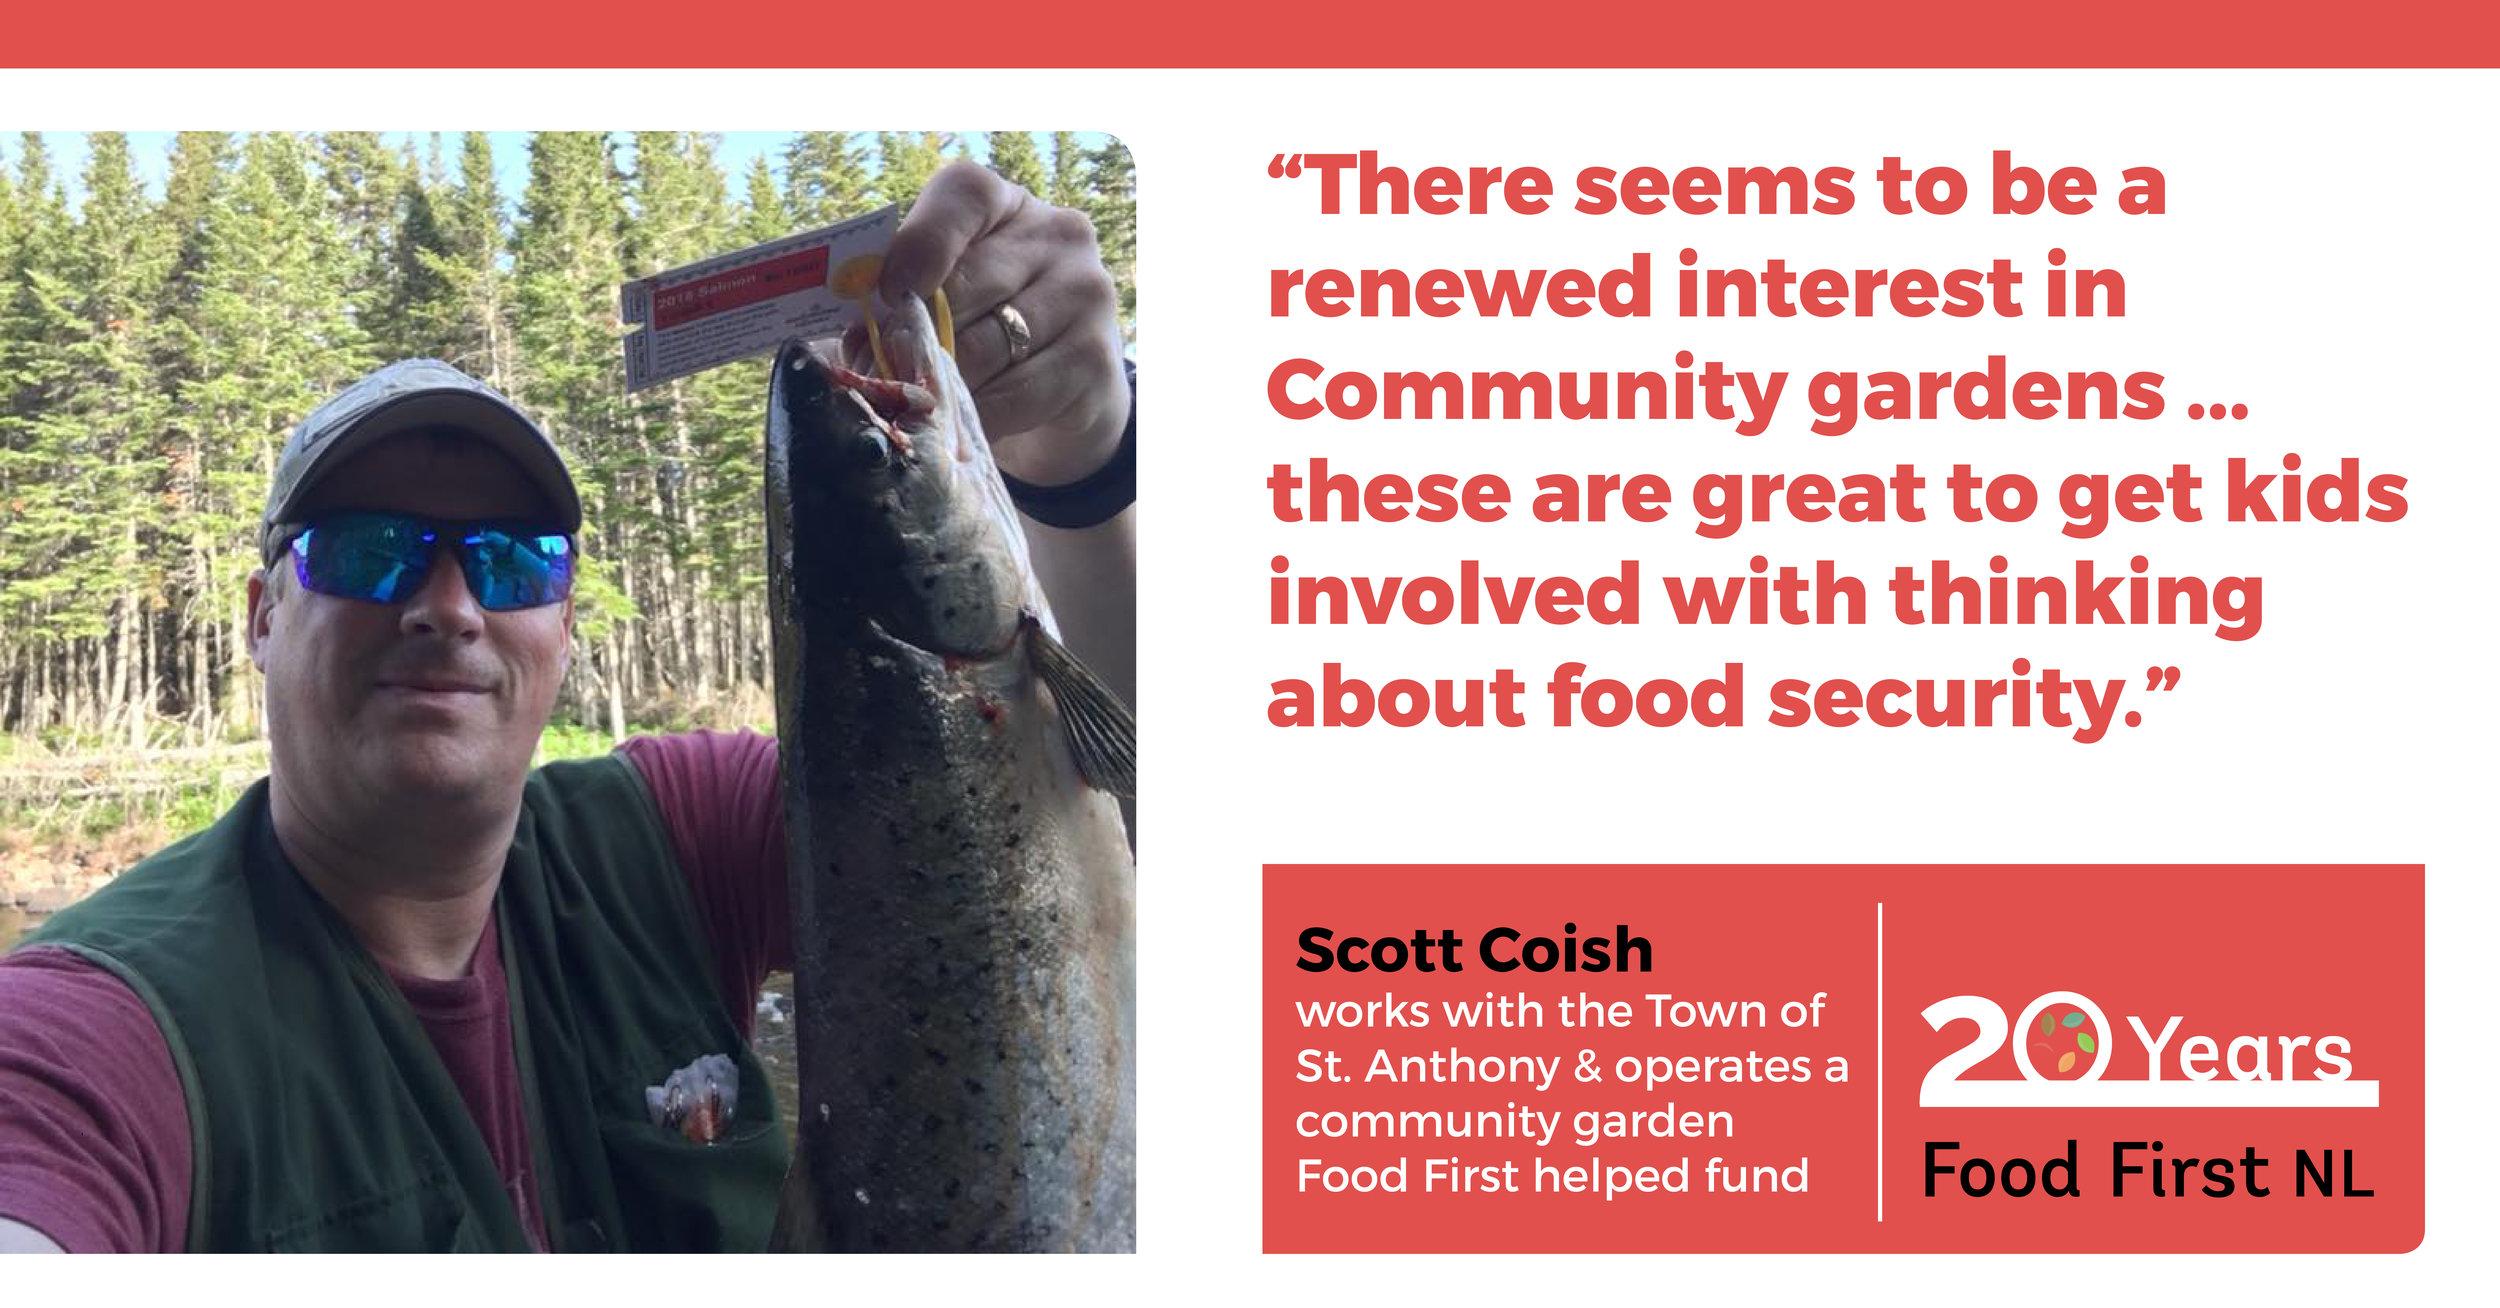 Scott Coish Card 2.jpg